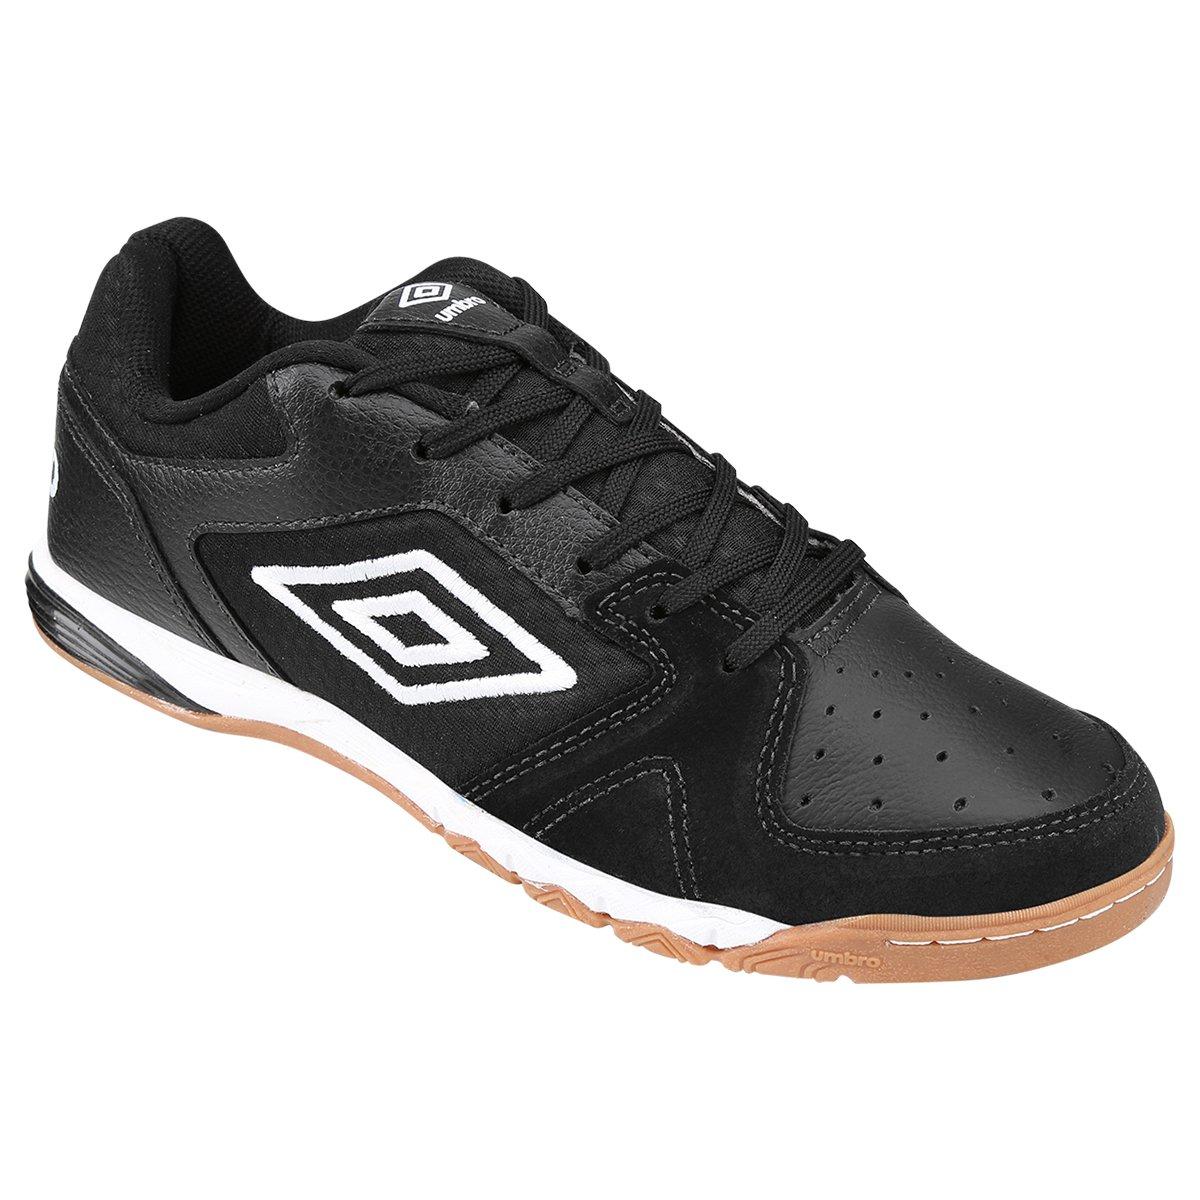 9ada46e36c Chuteira Umbro Pro 3 Futsal - Compre Agora